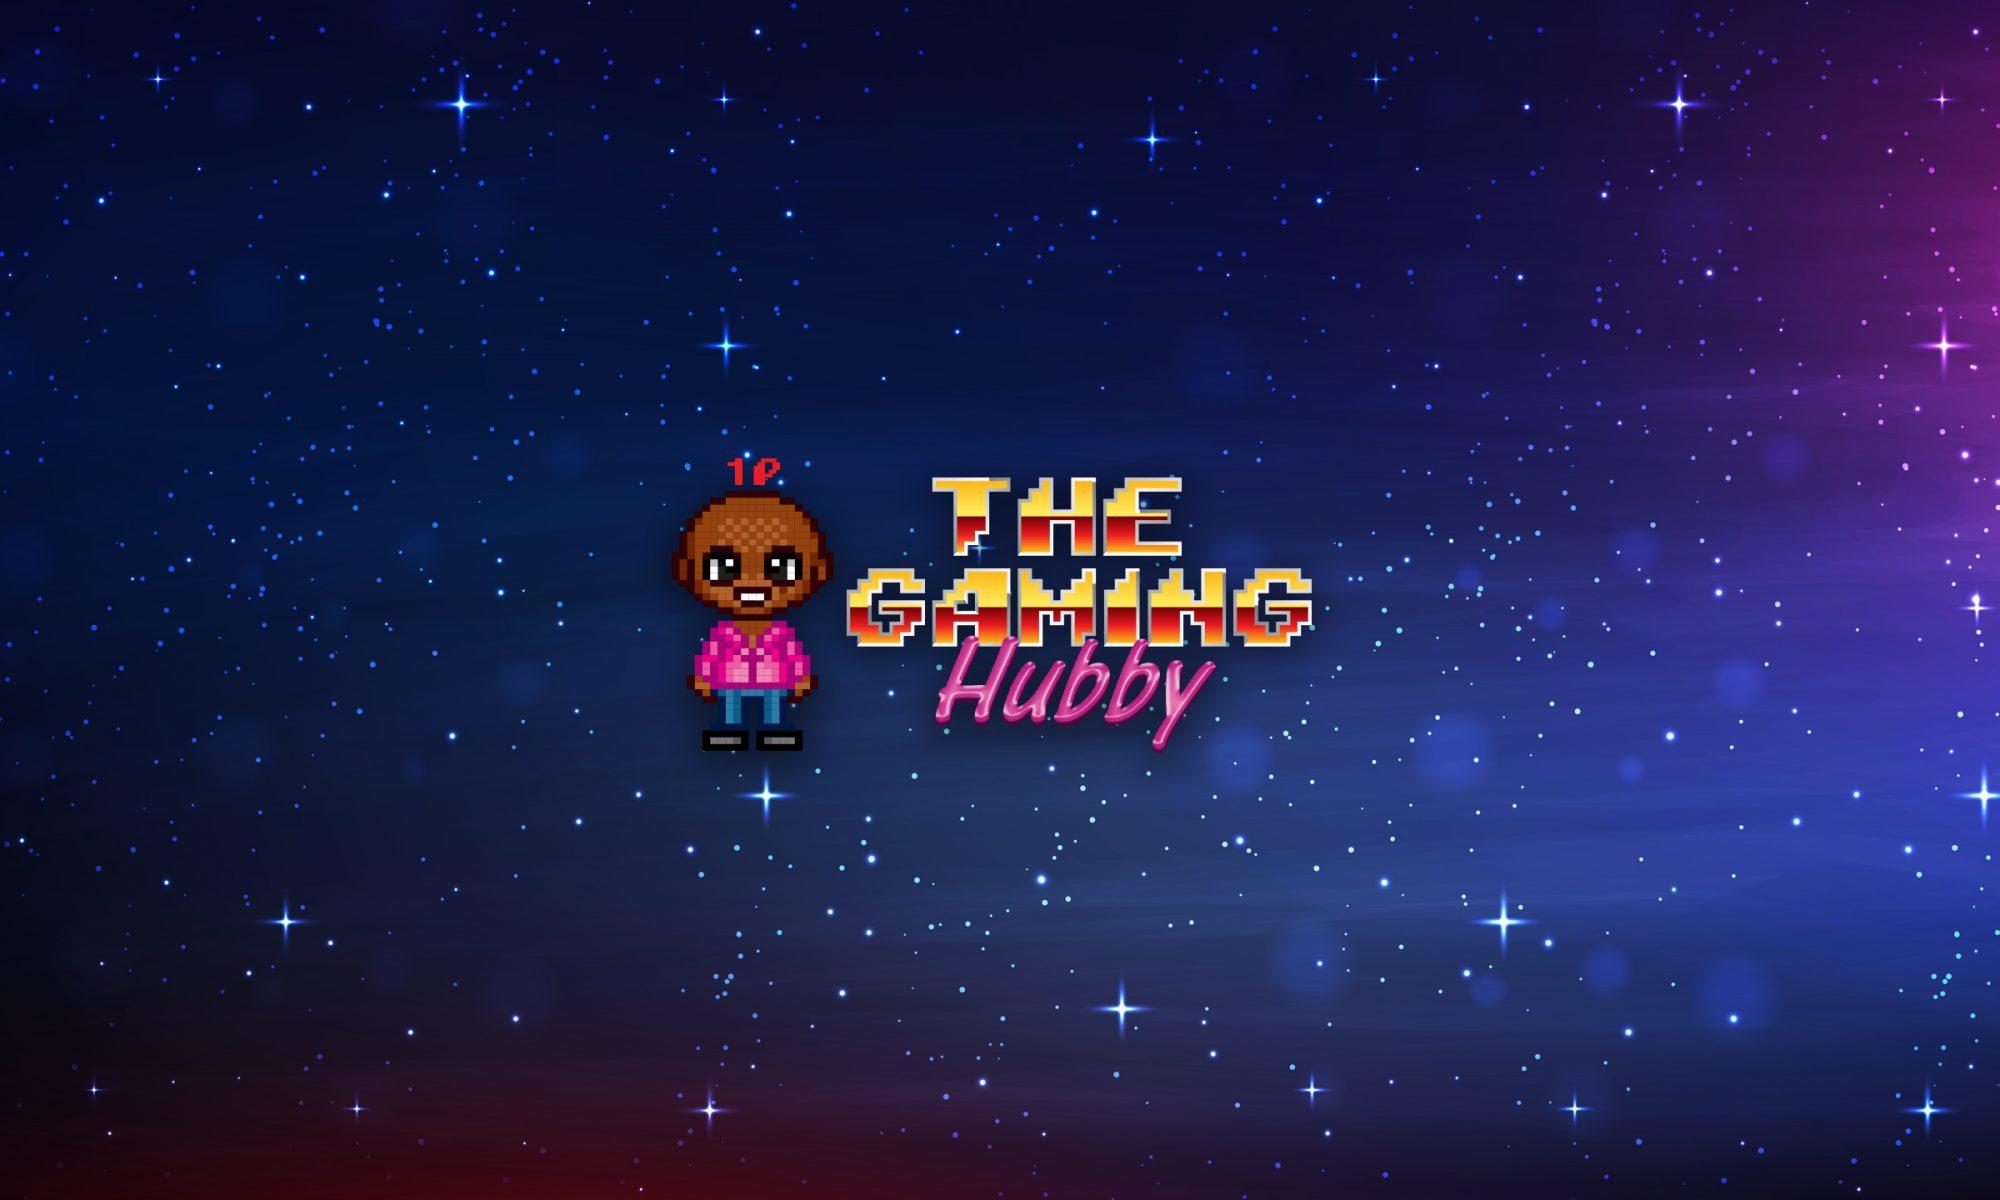 thegaminghubby